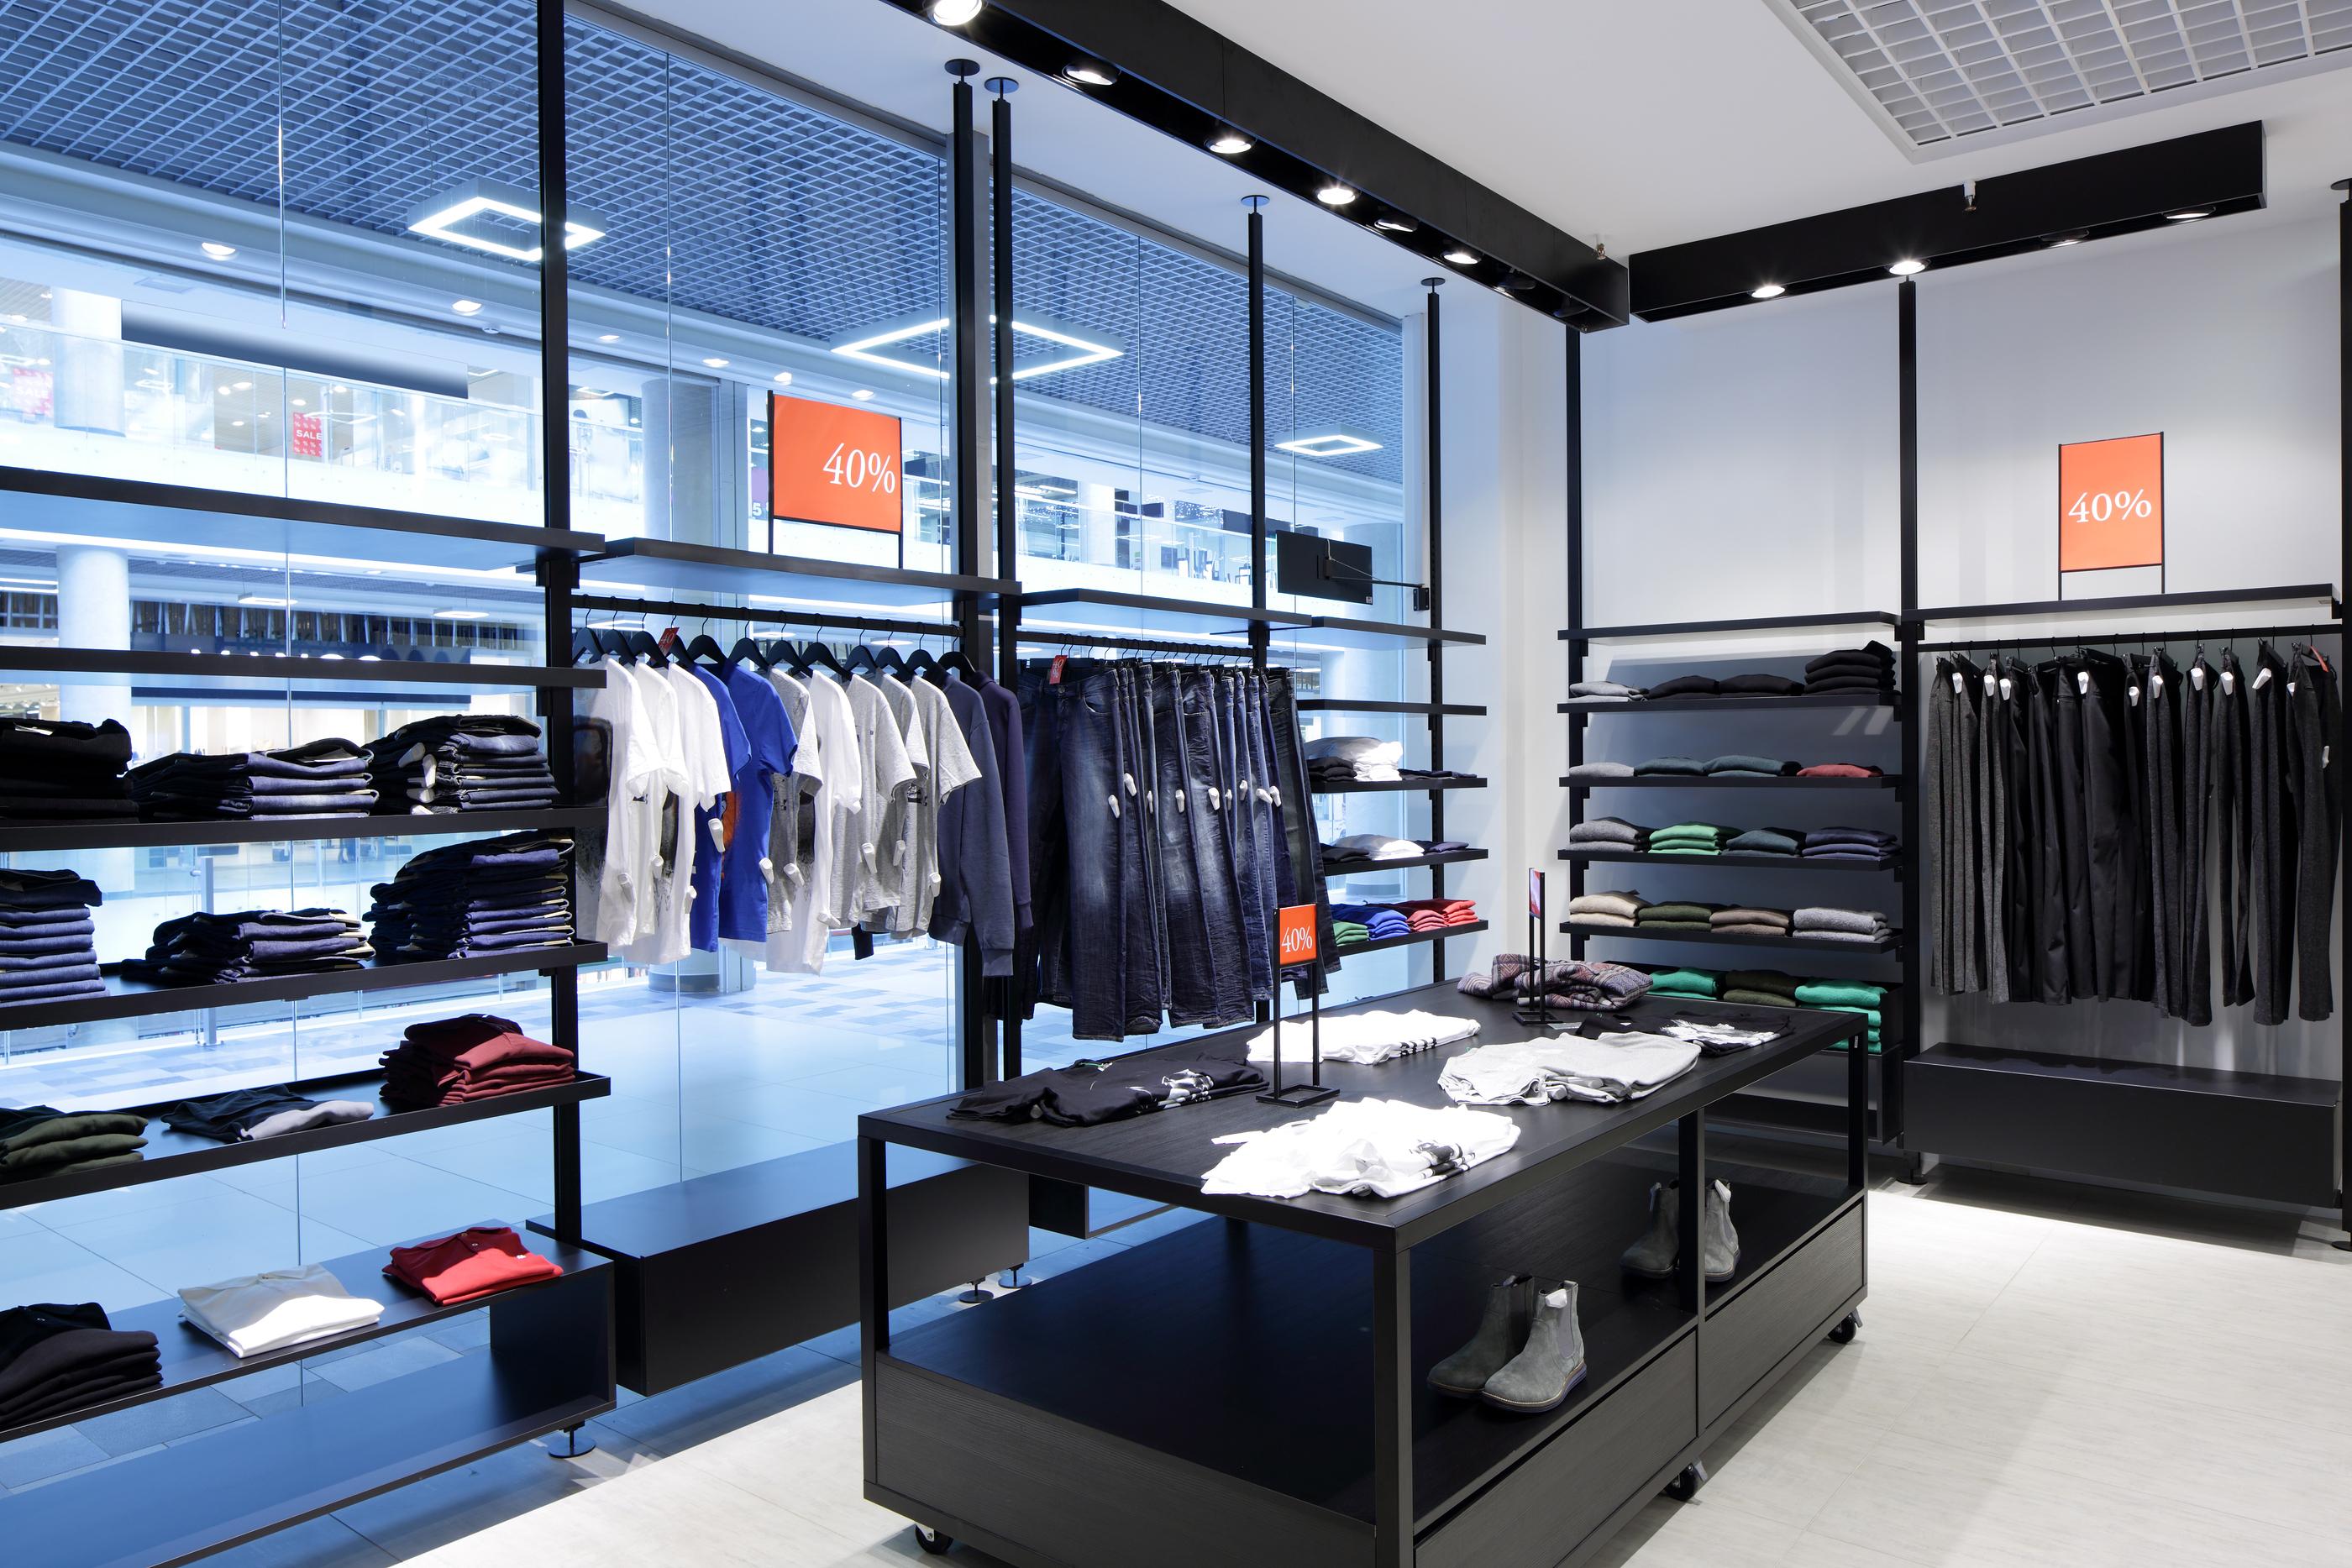 Brand New Interior Of Cloth Store.jpg